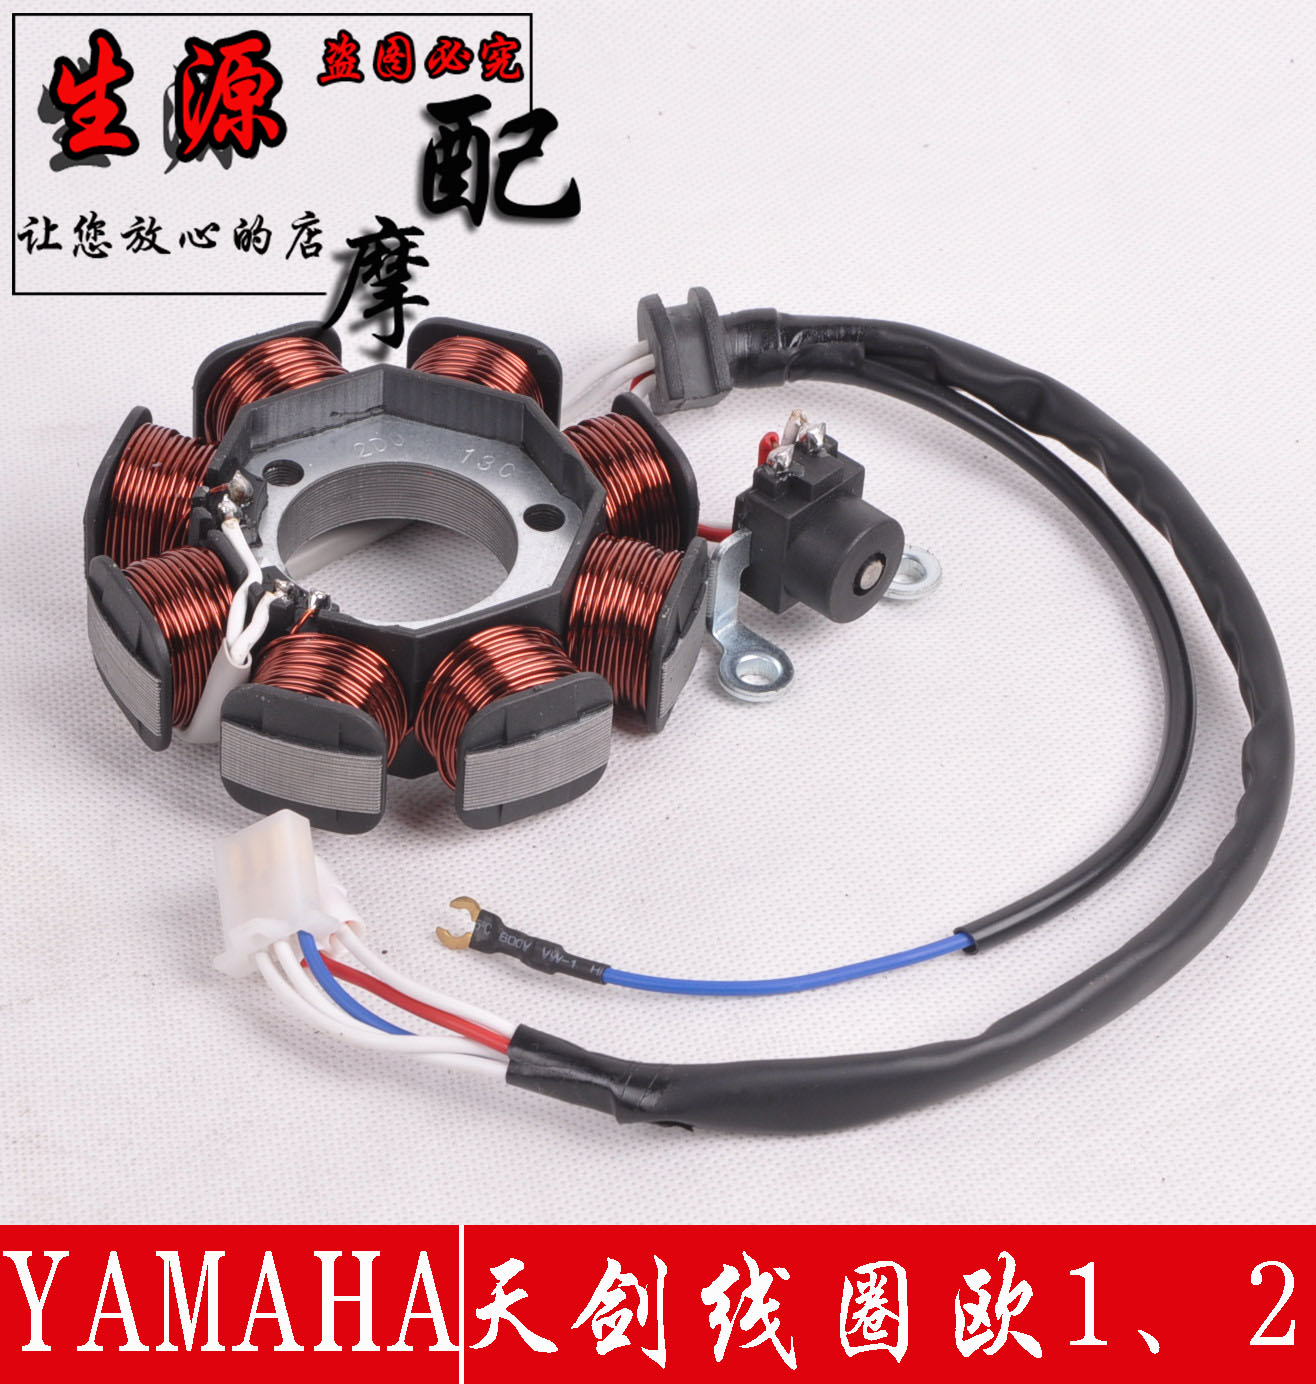 Запчасти для мотоциклов Yamaha 125 YBR125 запчасти для мотоциклов honda yamaha ttr ttr250